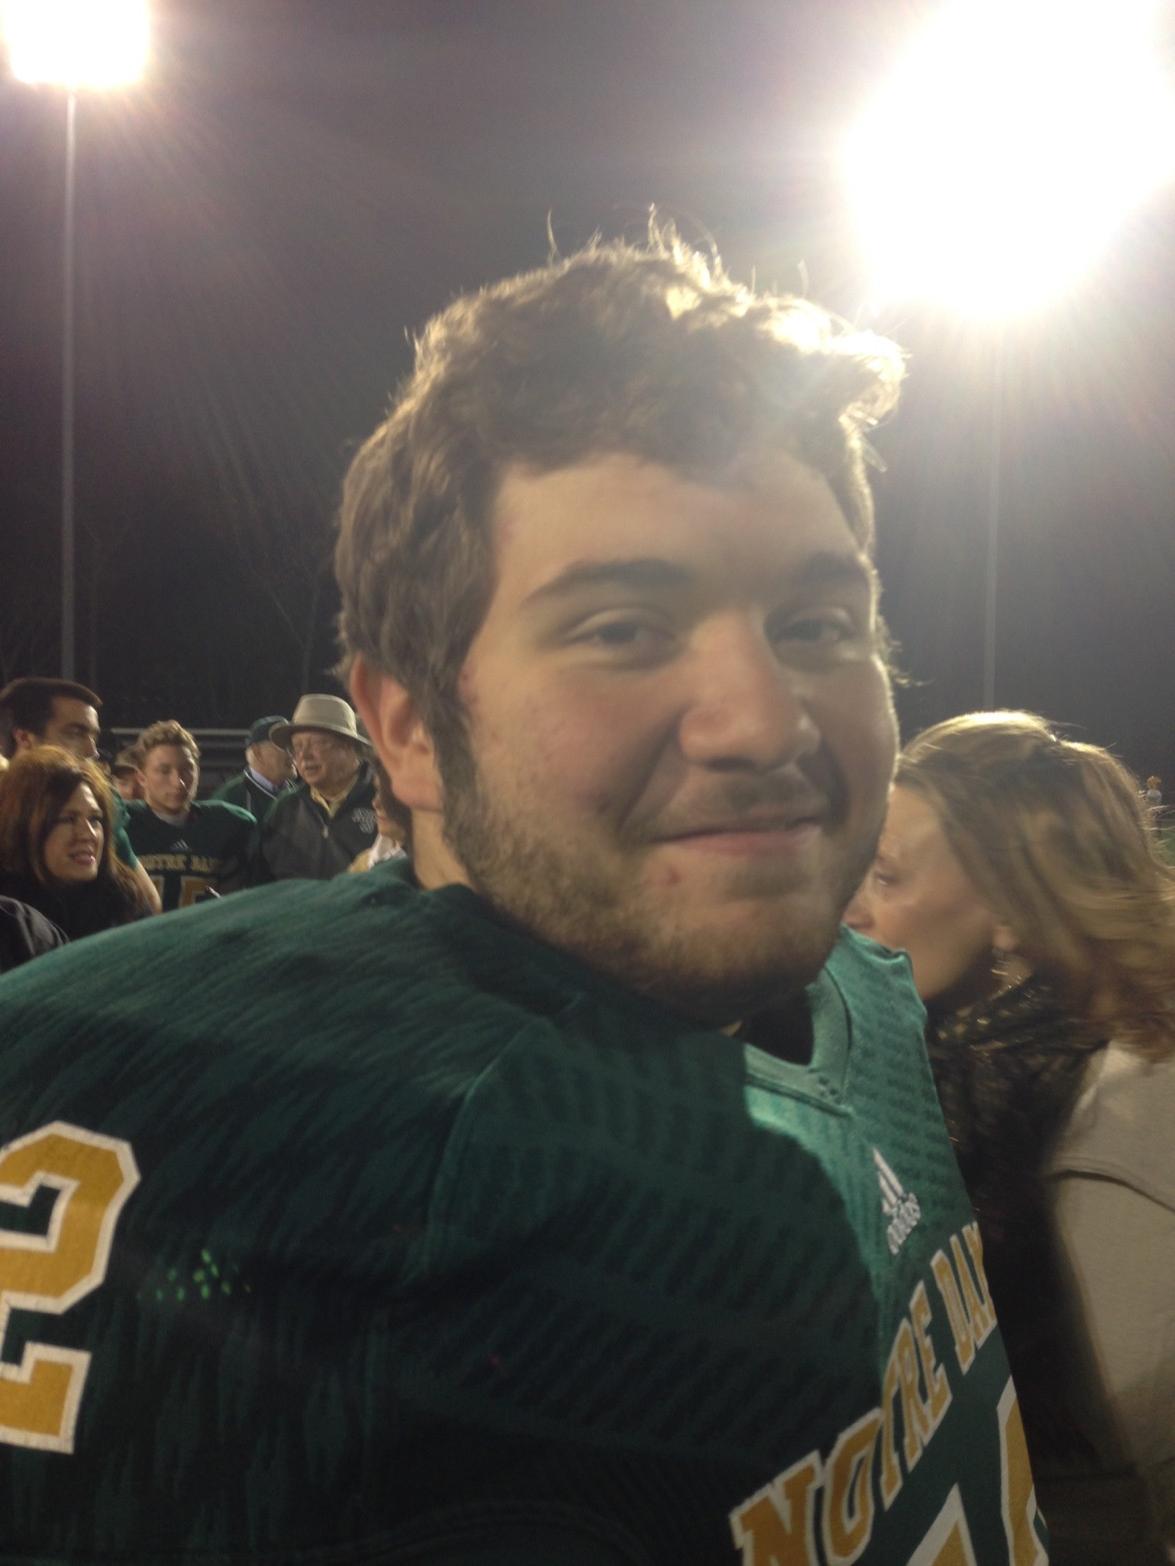 RT @mattcasey9: Is that Andrew Luck? RT @ProFootballTalk: Yeah Senior night. http://t.co/gwg1lb3MxF